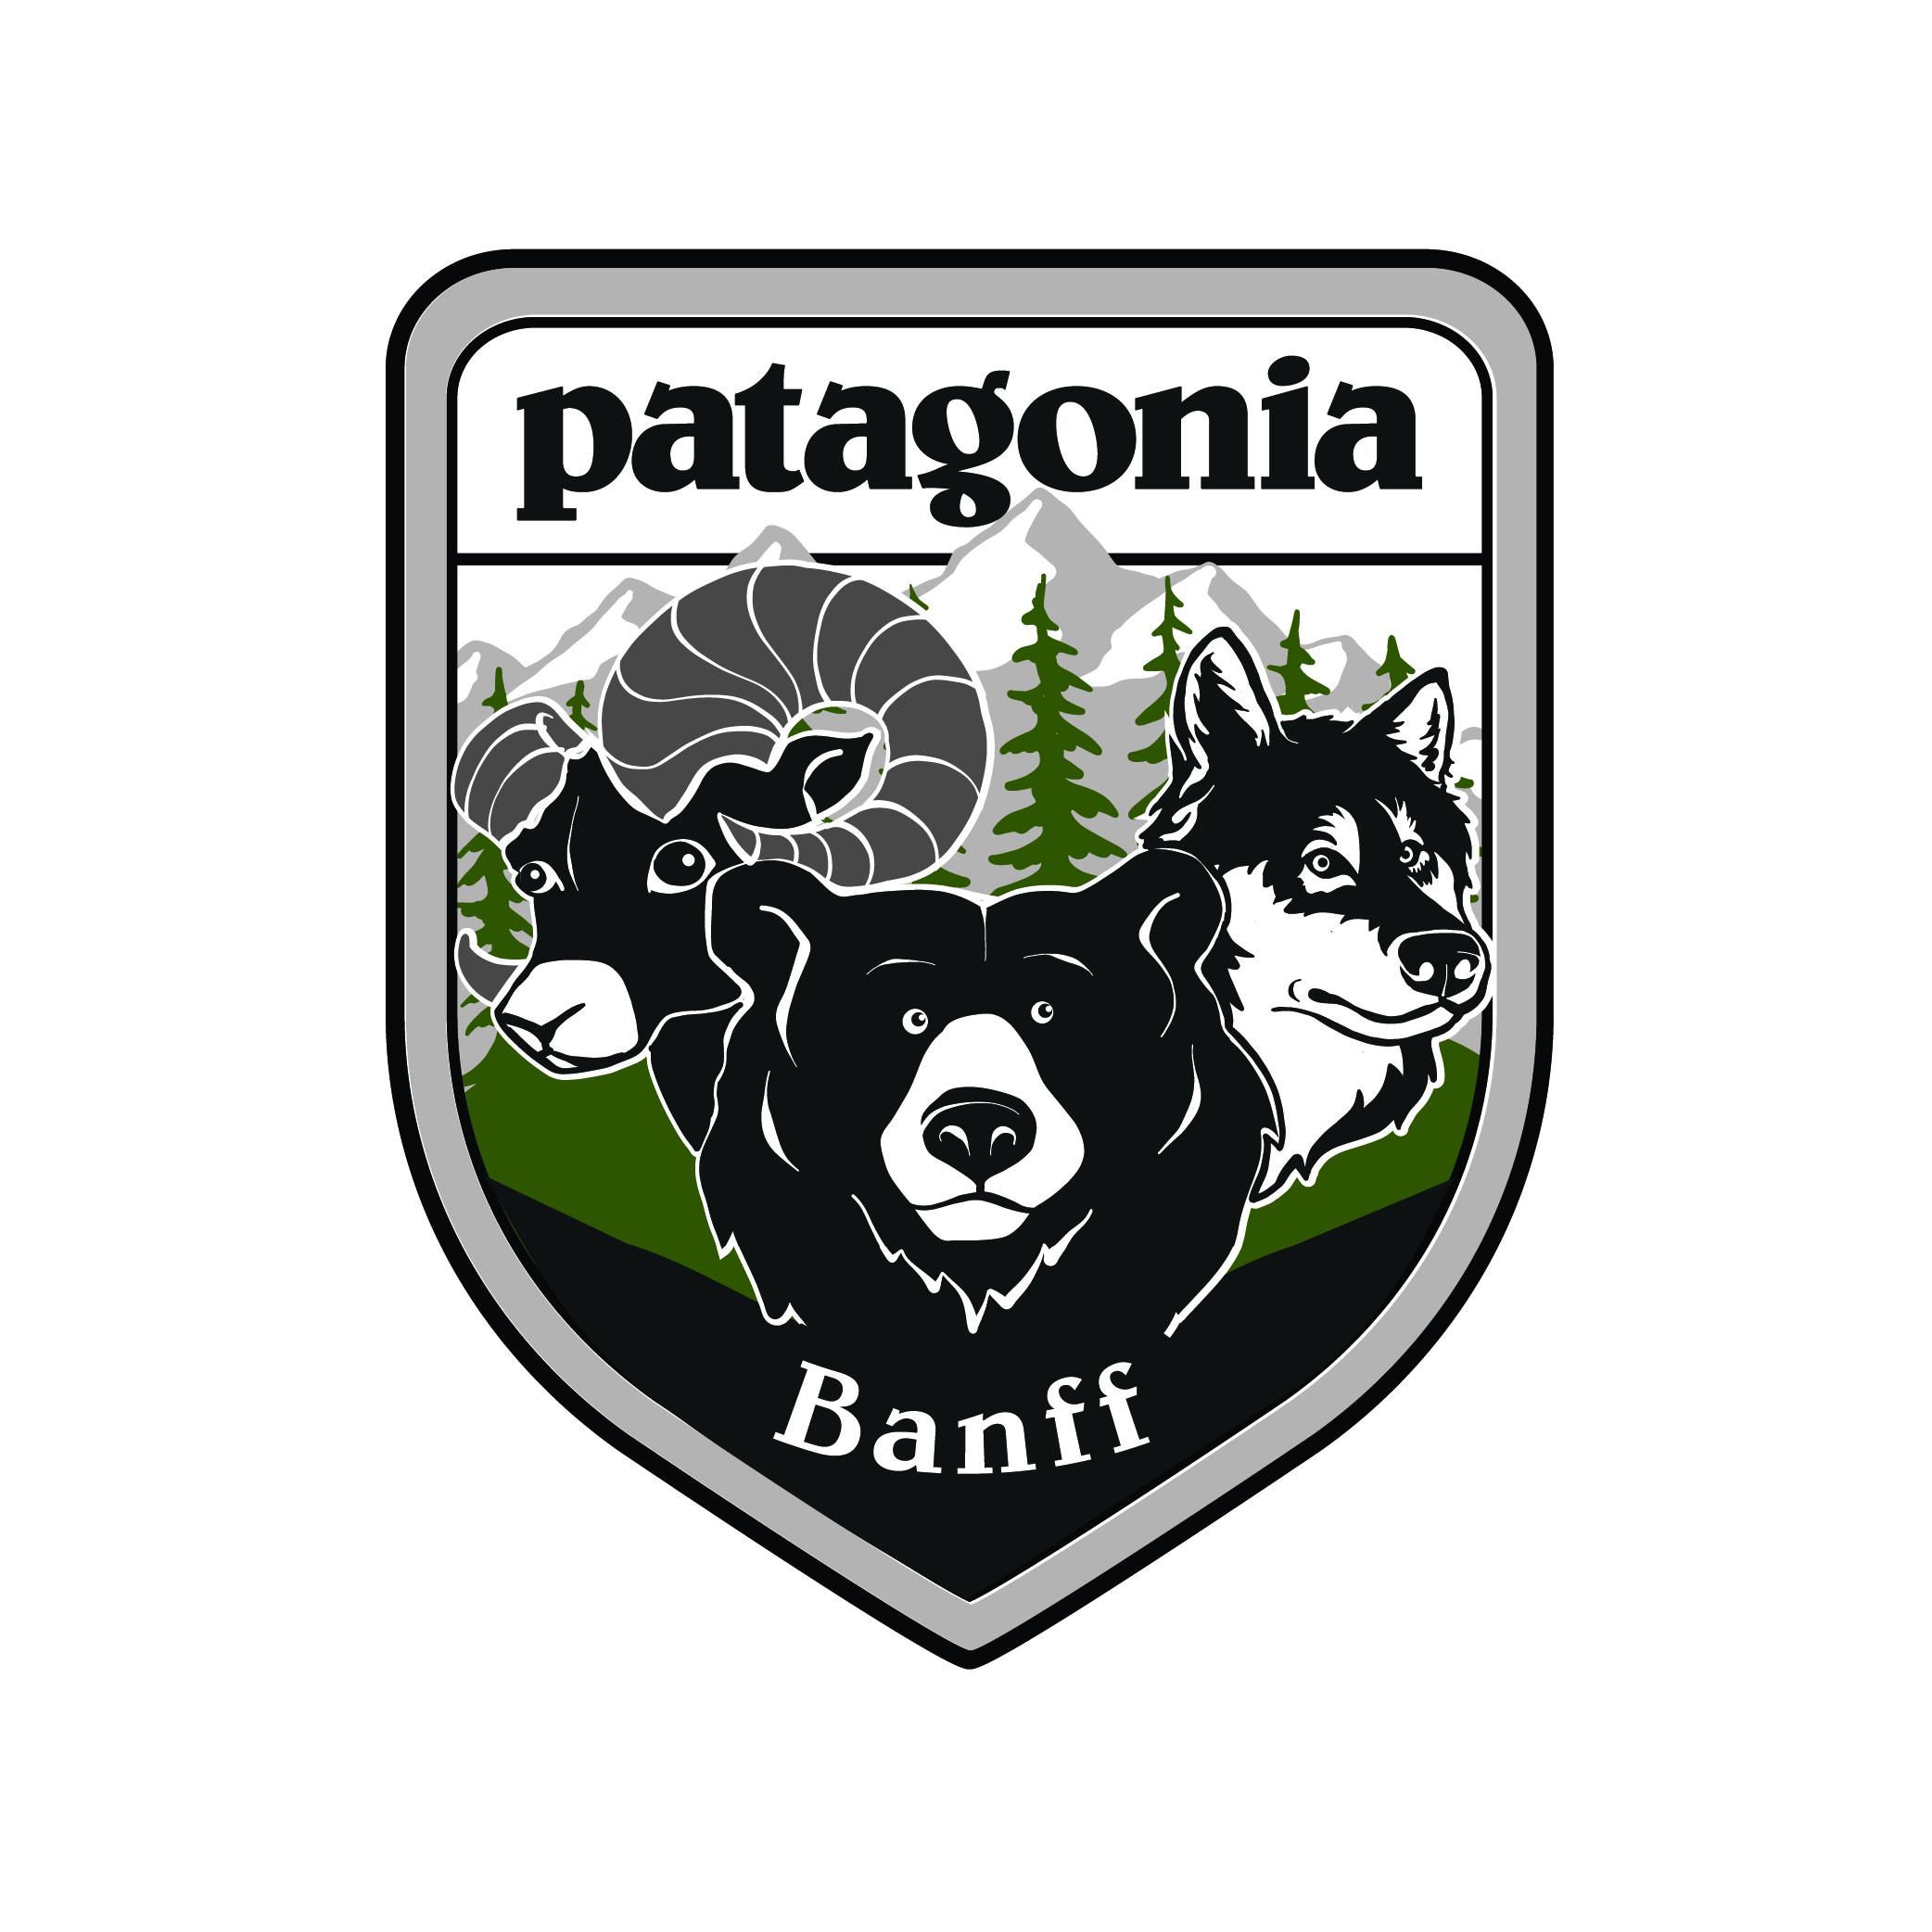 Patagonia Banff - Patch Design